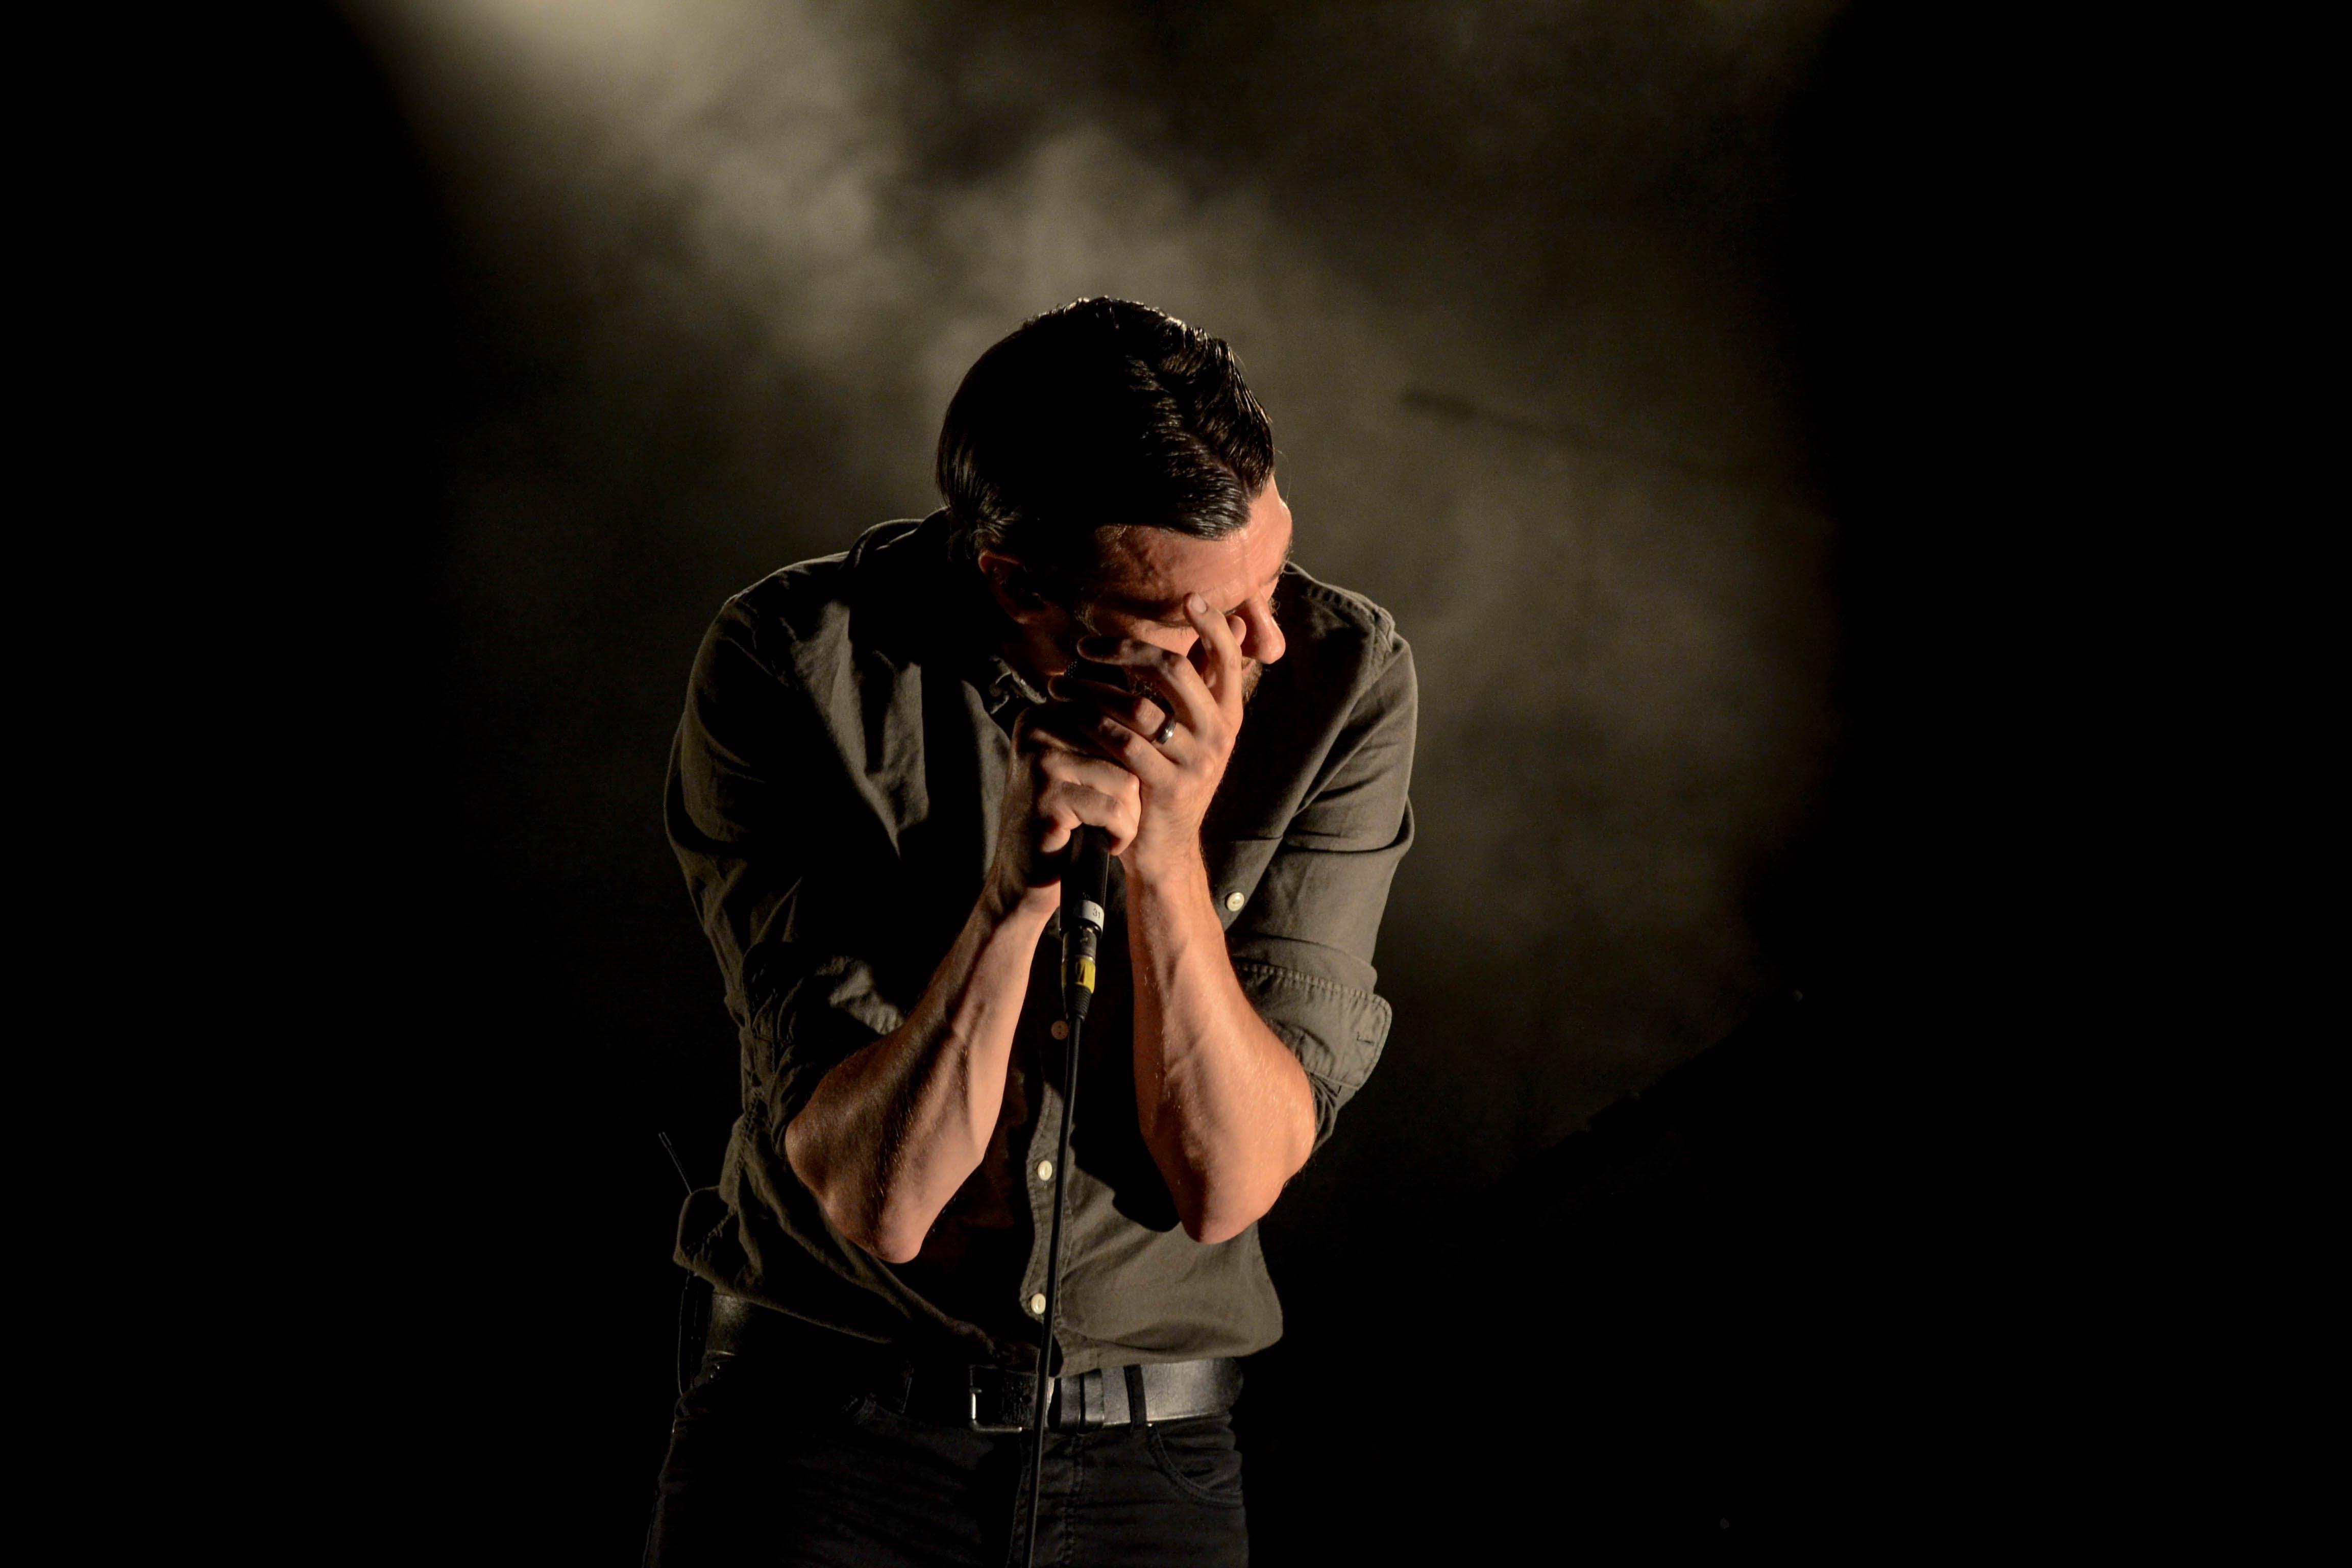 Man in Gray Dress Shirt Holding Mic in Dark Room